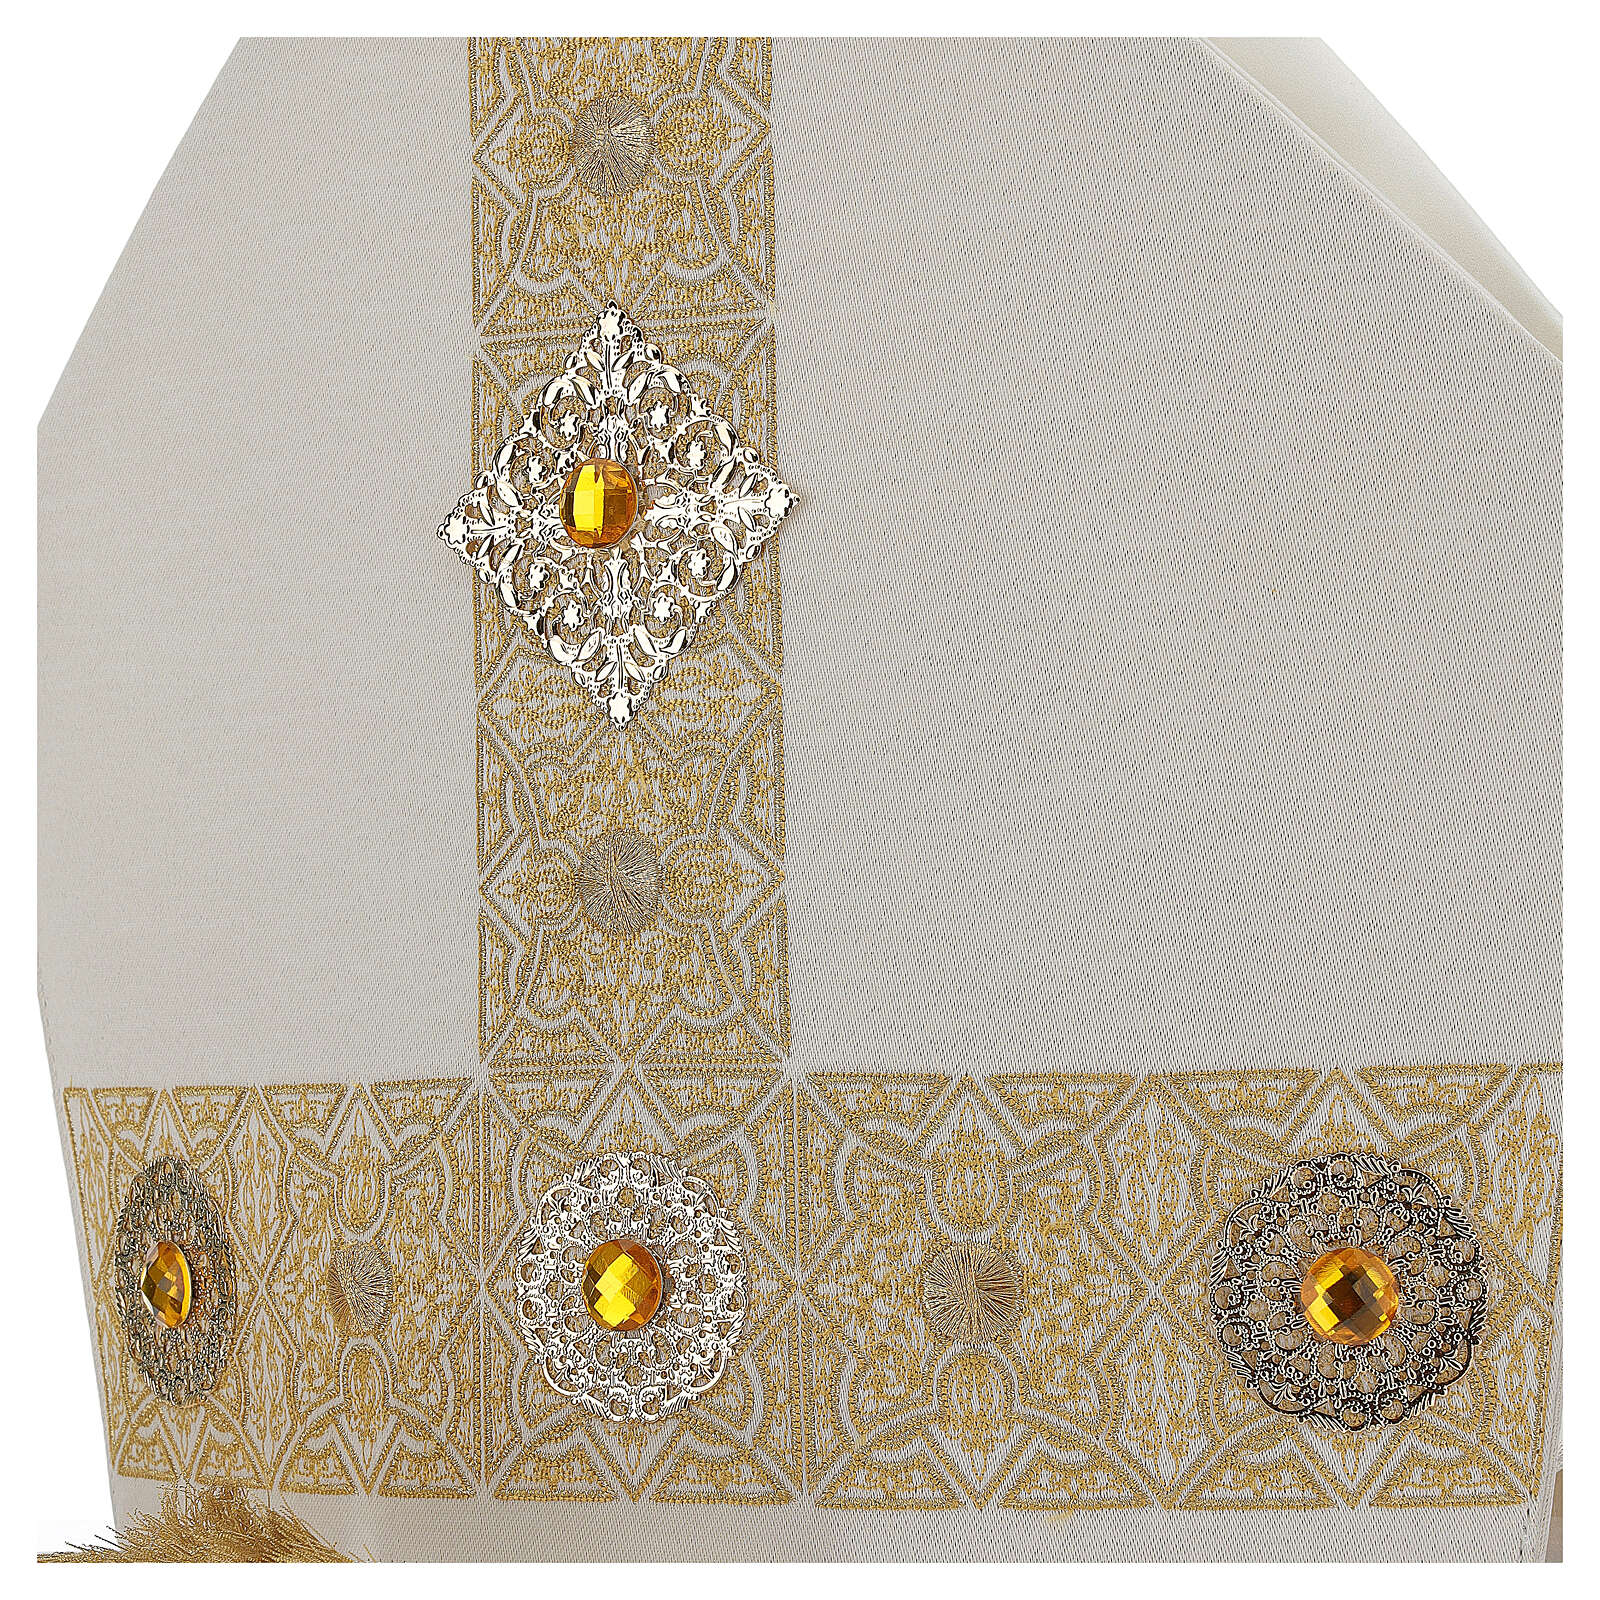 Mitra con ricamo dorato écru Limited Edition 3